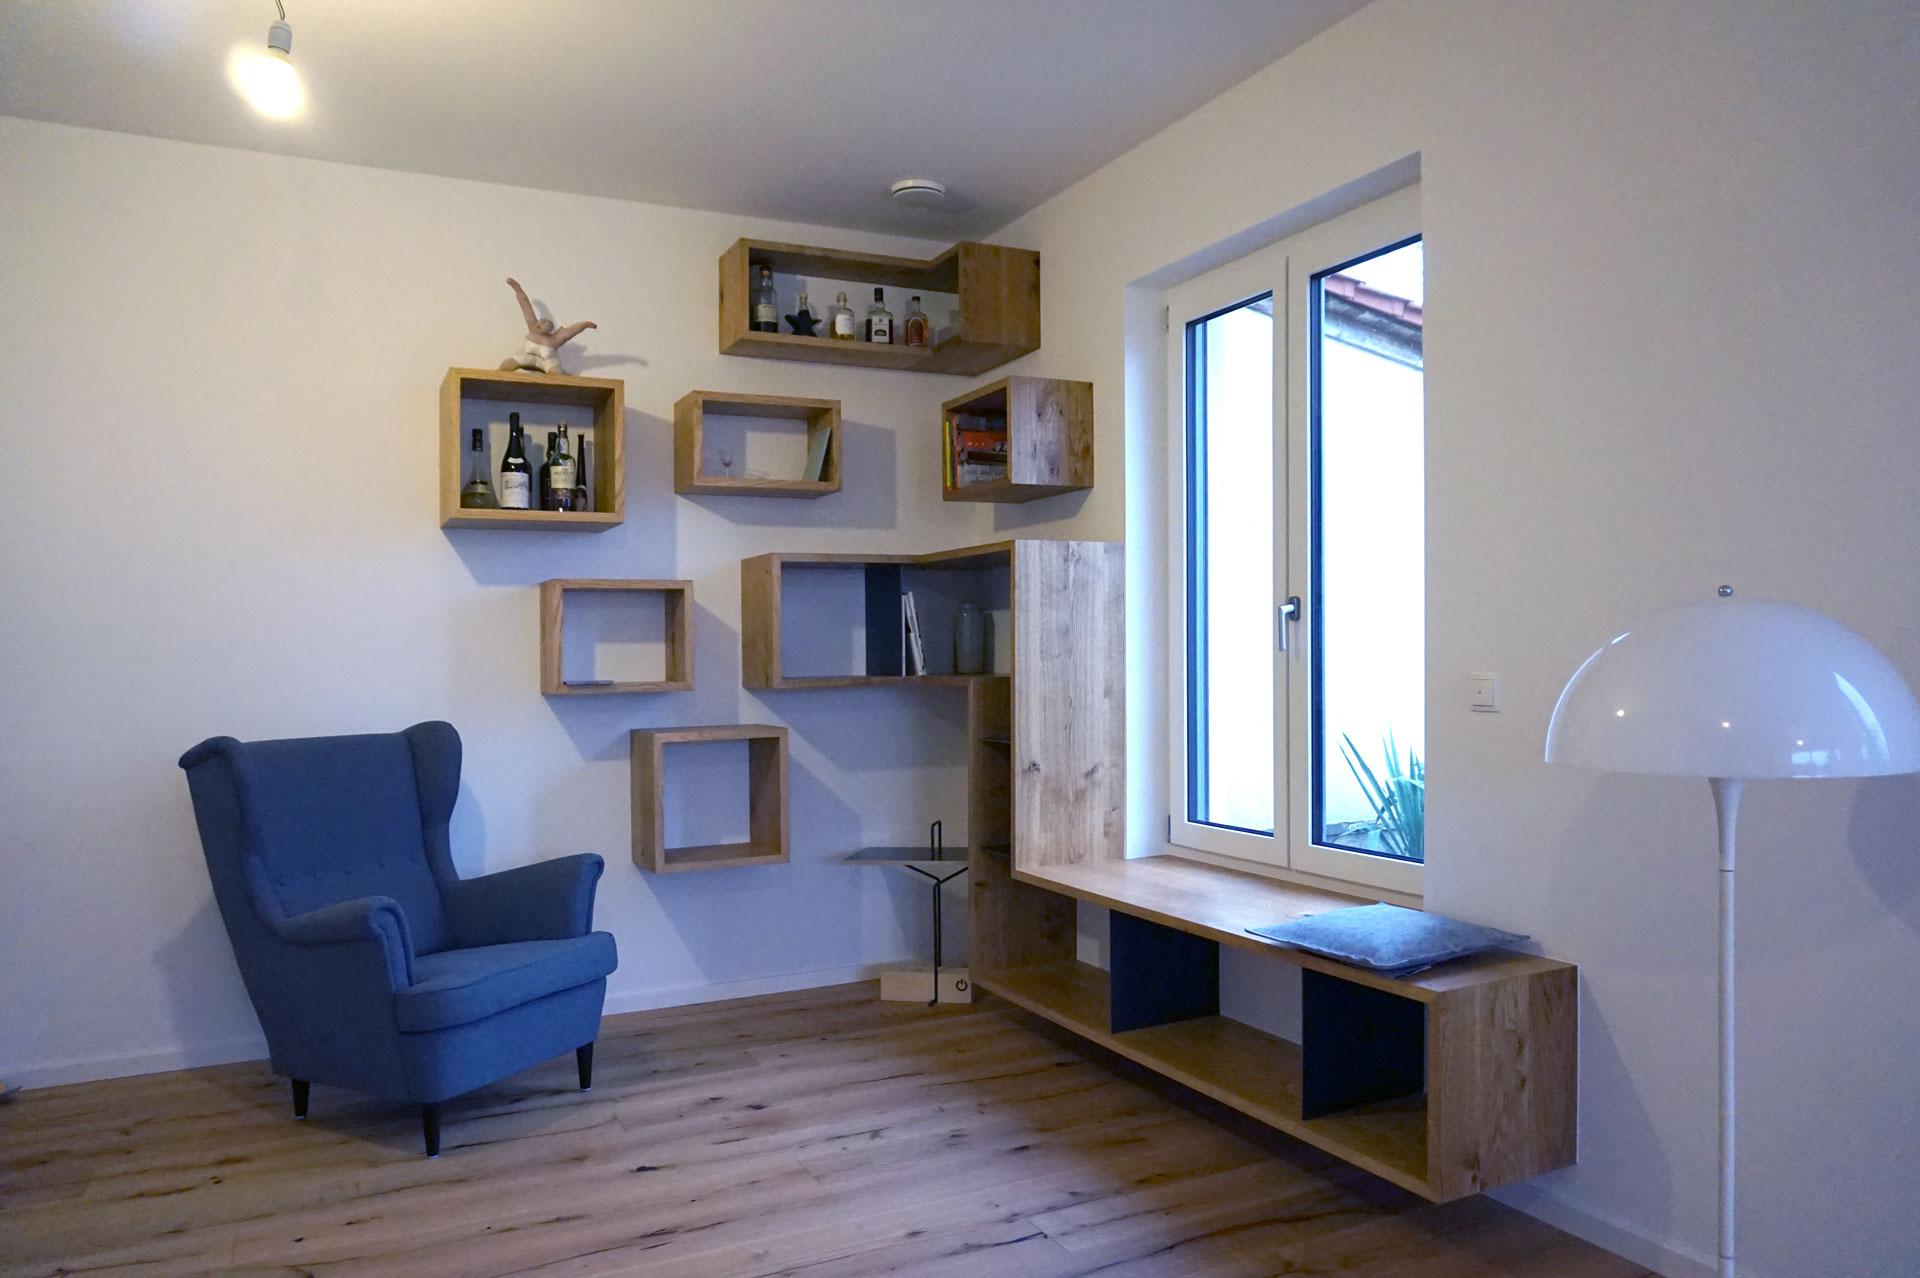 sitzbank regal schreinerei andreas st hle. Black Bedroom Furniture Sets. Home Design Ideas